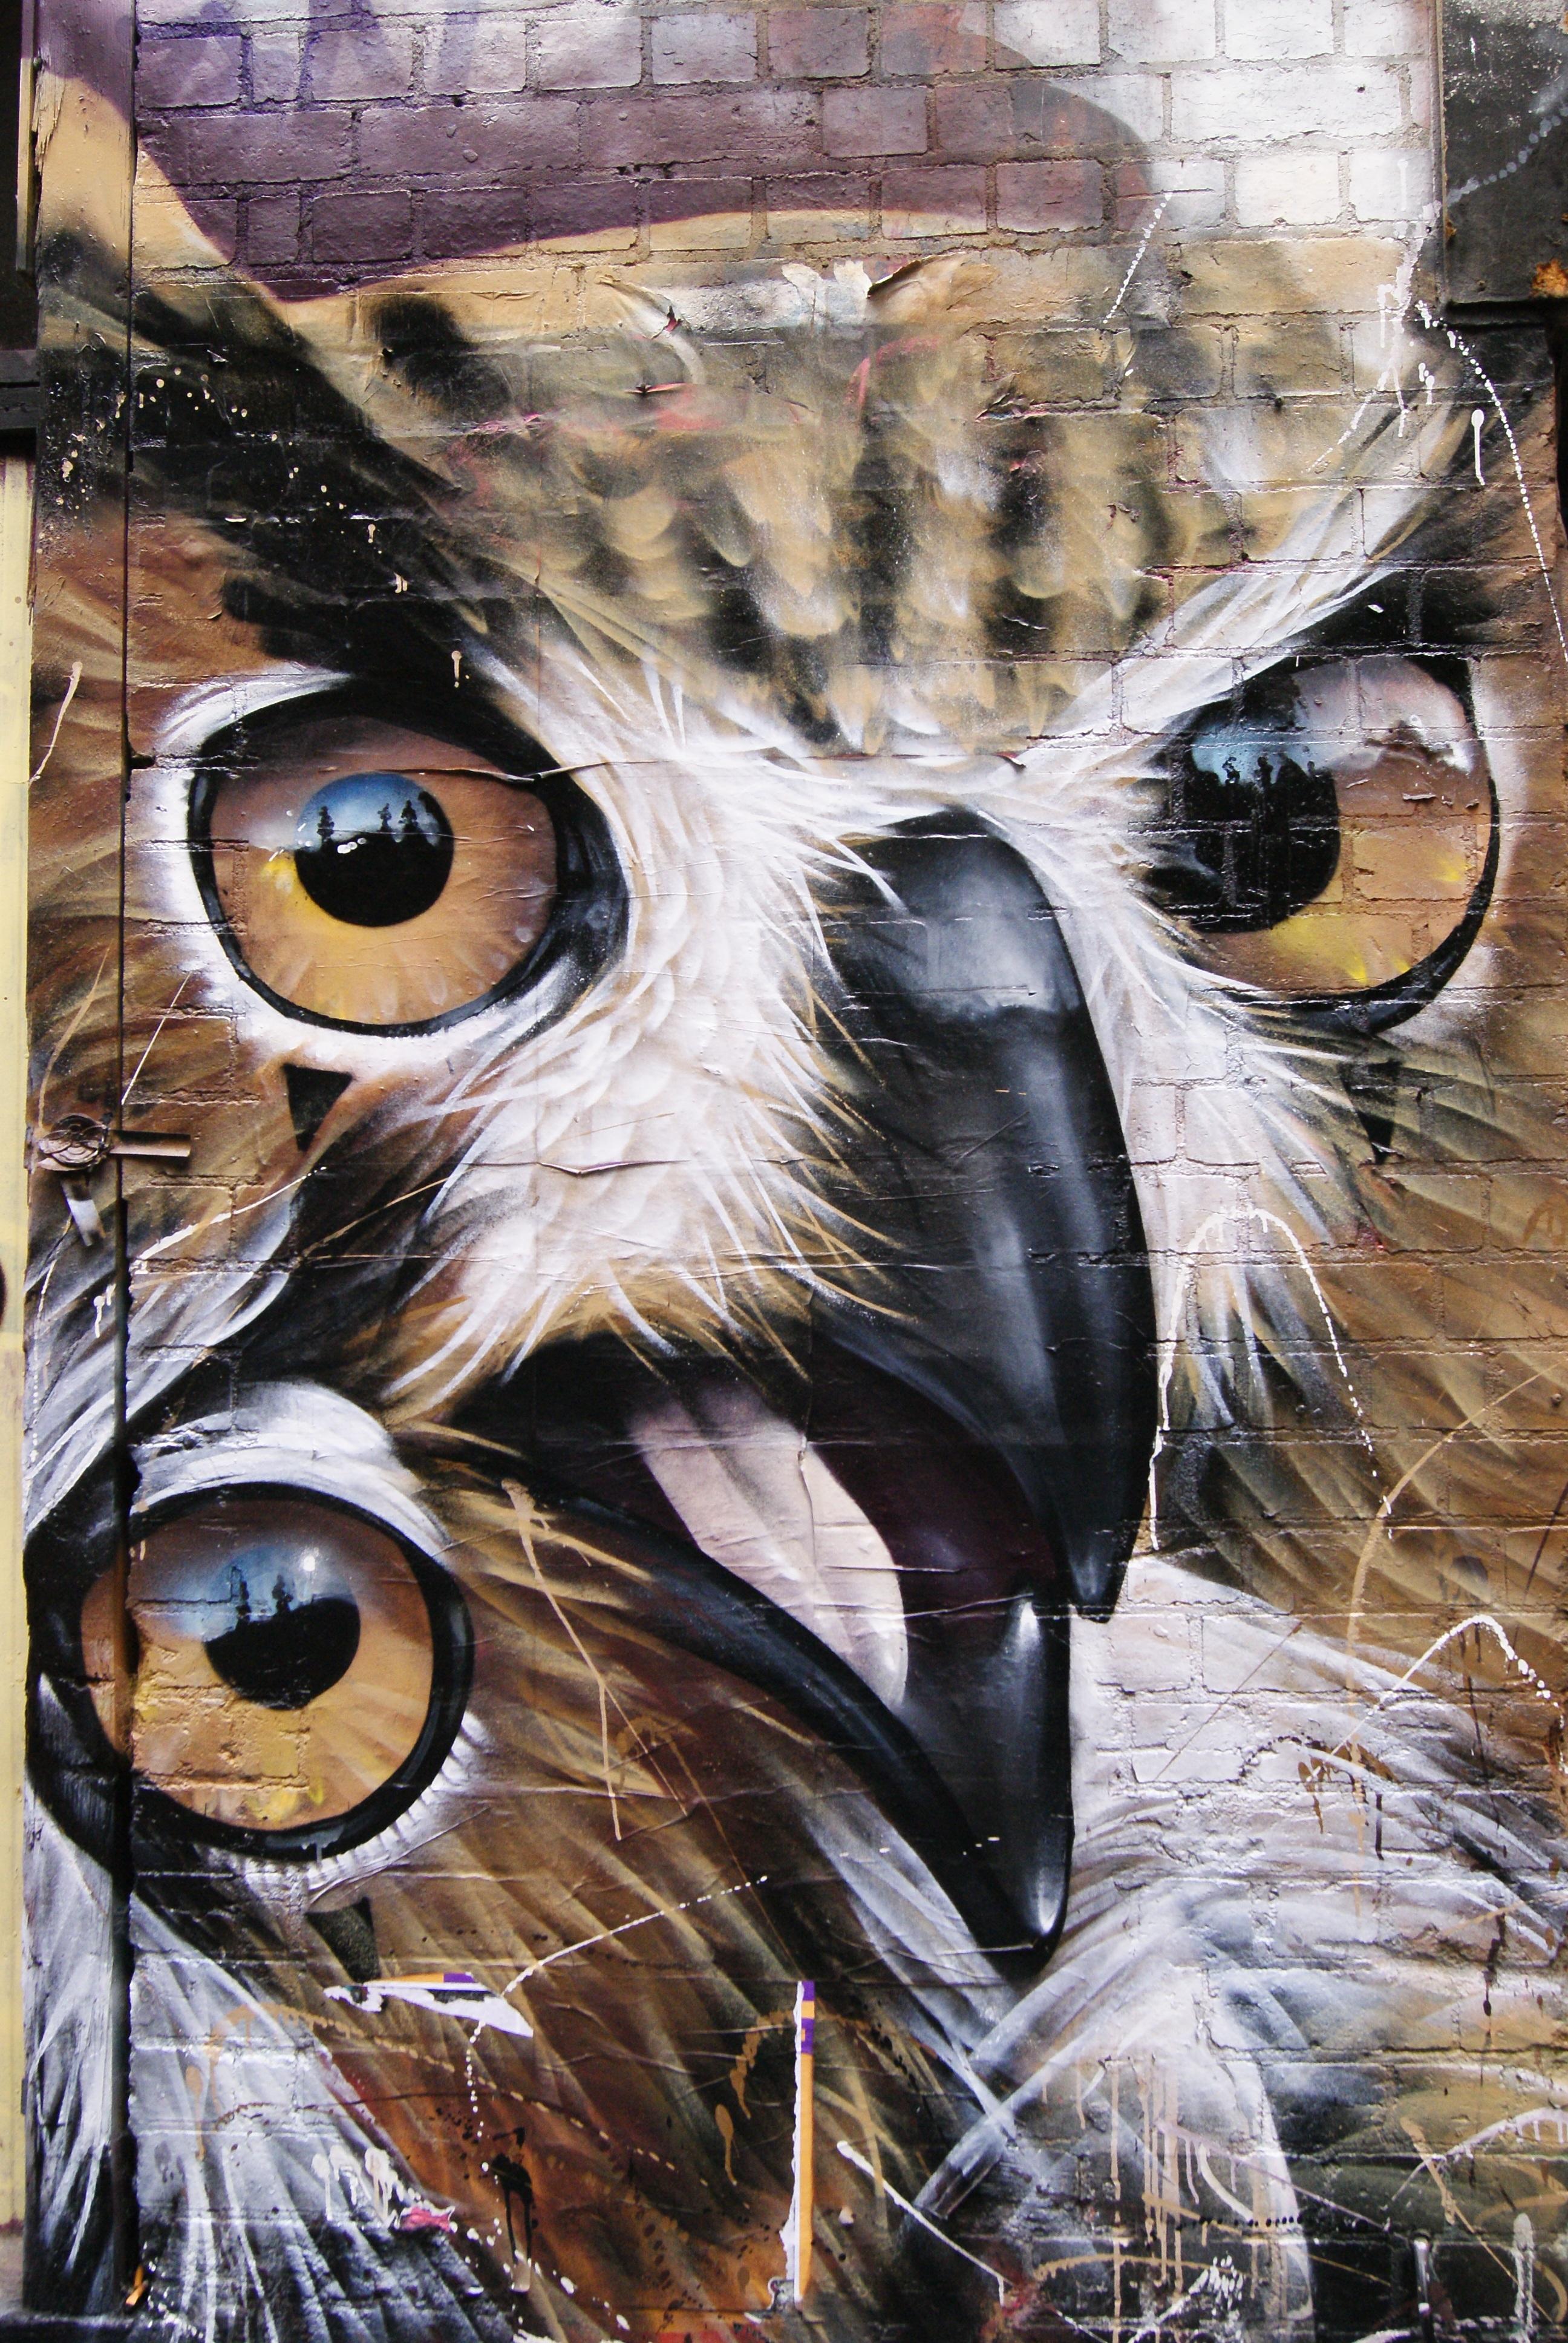 Gambar Kreatif Bangunan Kota Artistik Burung Hantu Karya